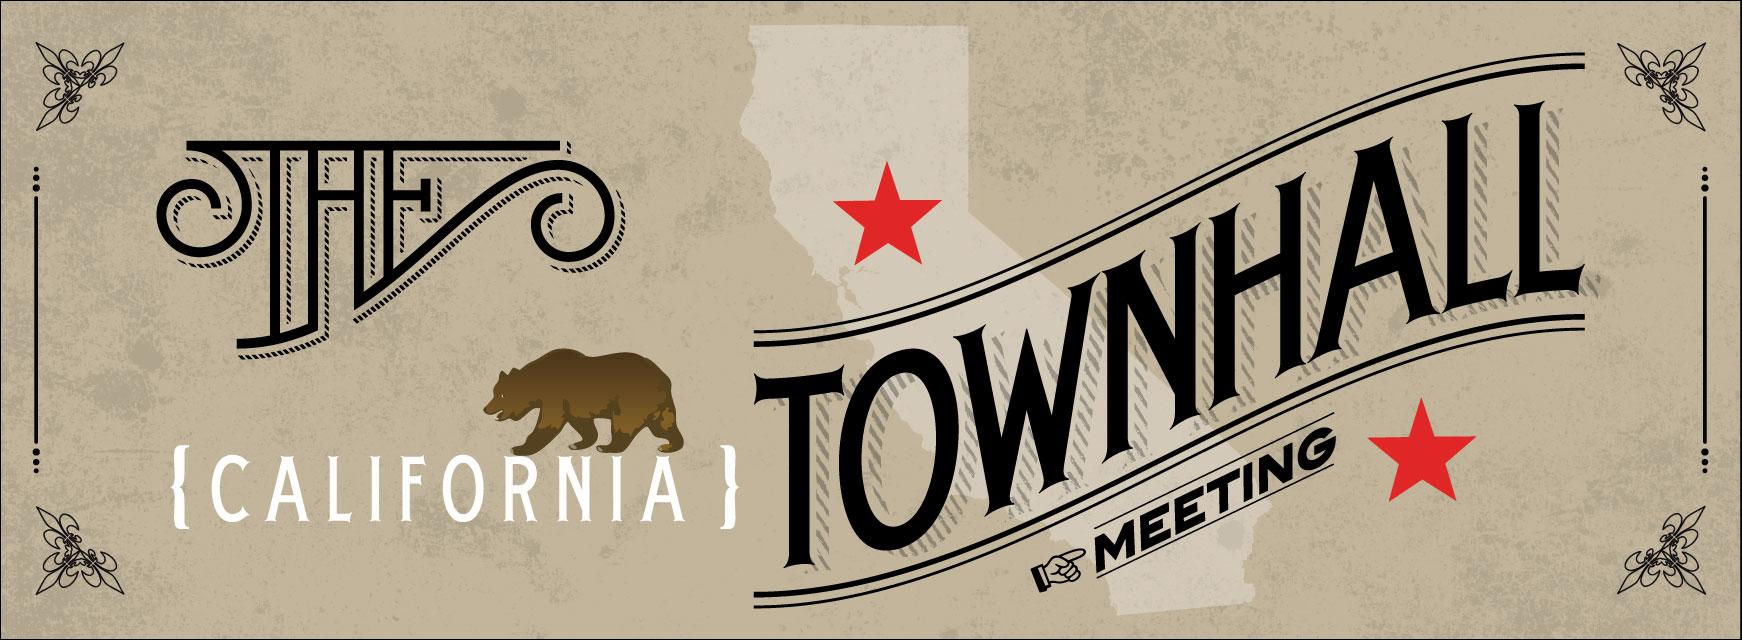 california-town-hall-meeting